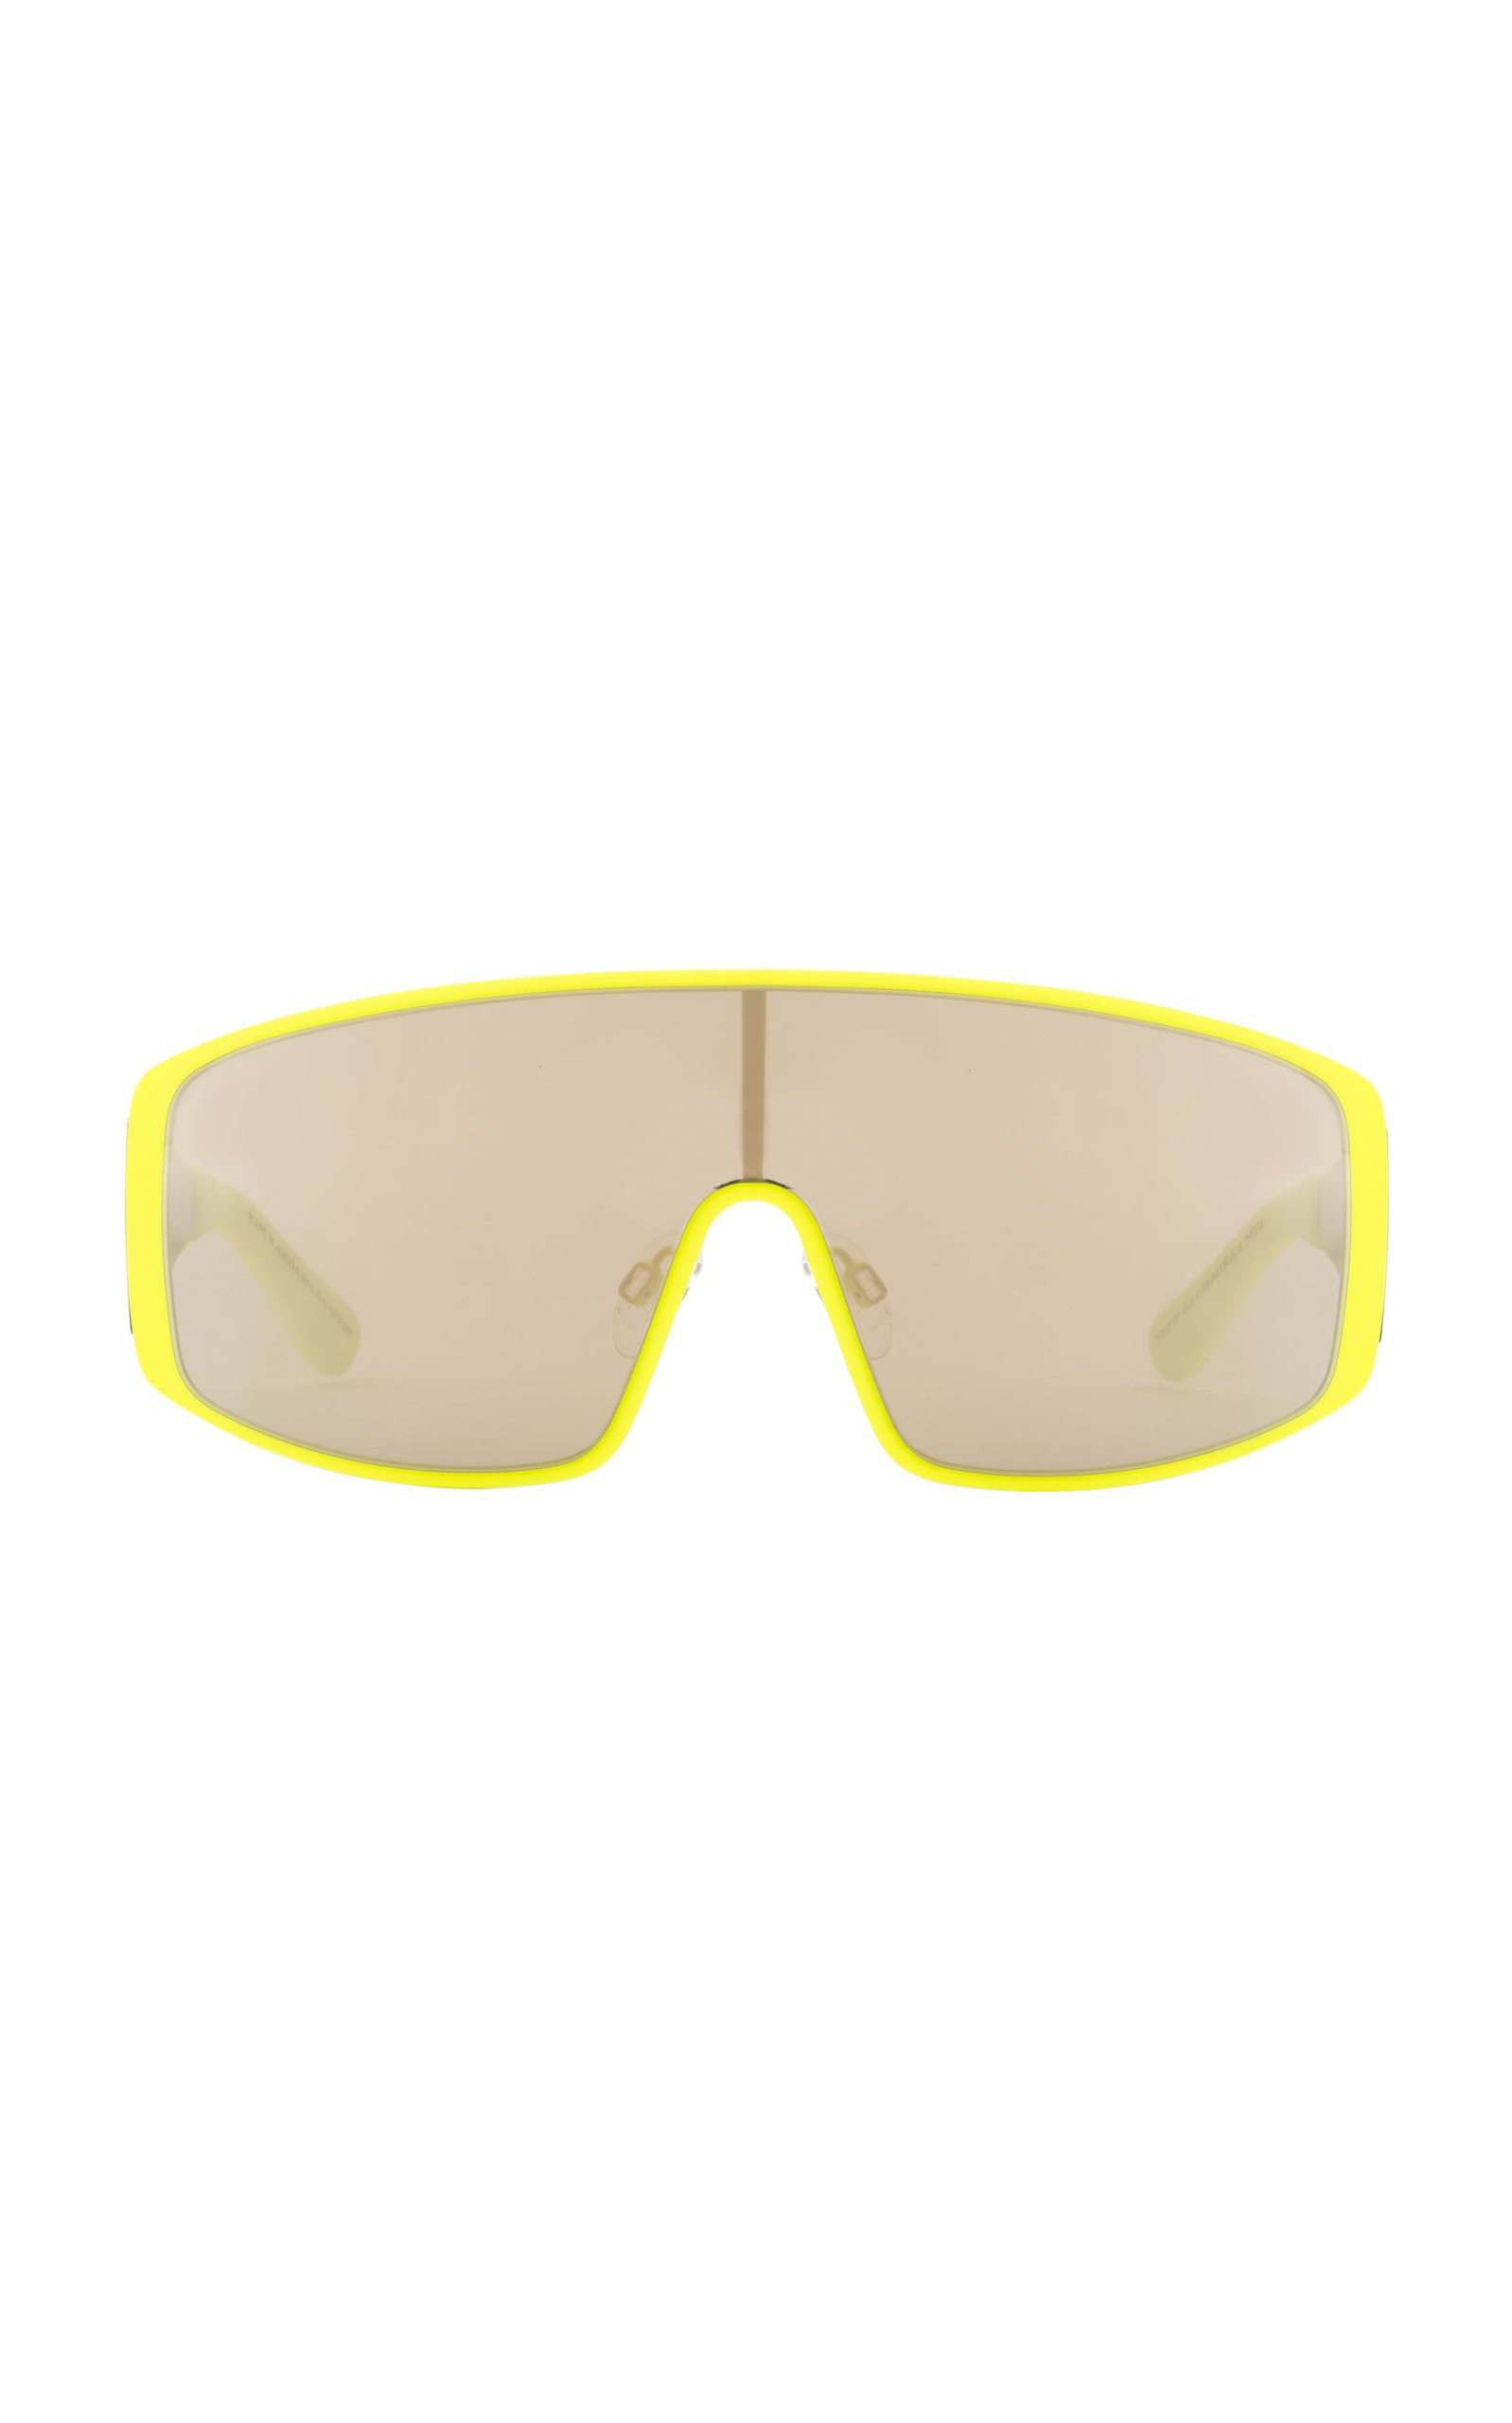 Carolina Lemke x Kim Kardashian West Gemini D-Frame Acetate Sunglasses